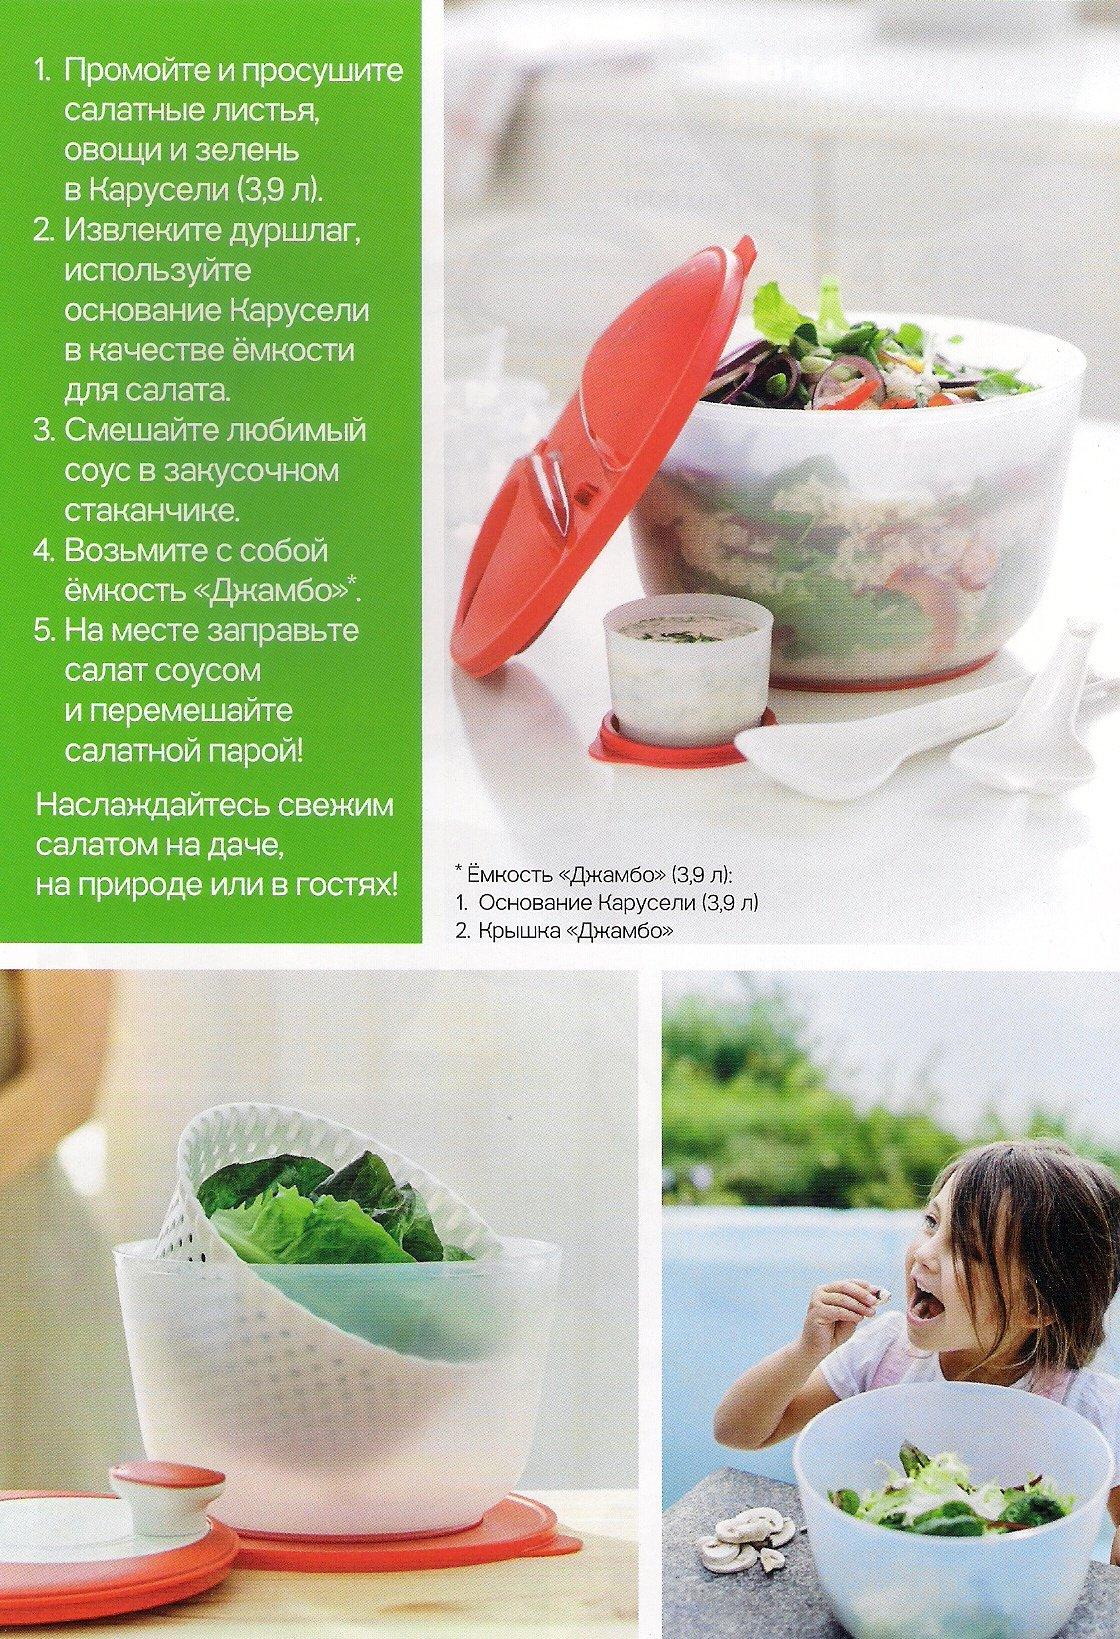 http://tupperware-online.ru/images/upload/7a.jpg